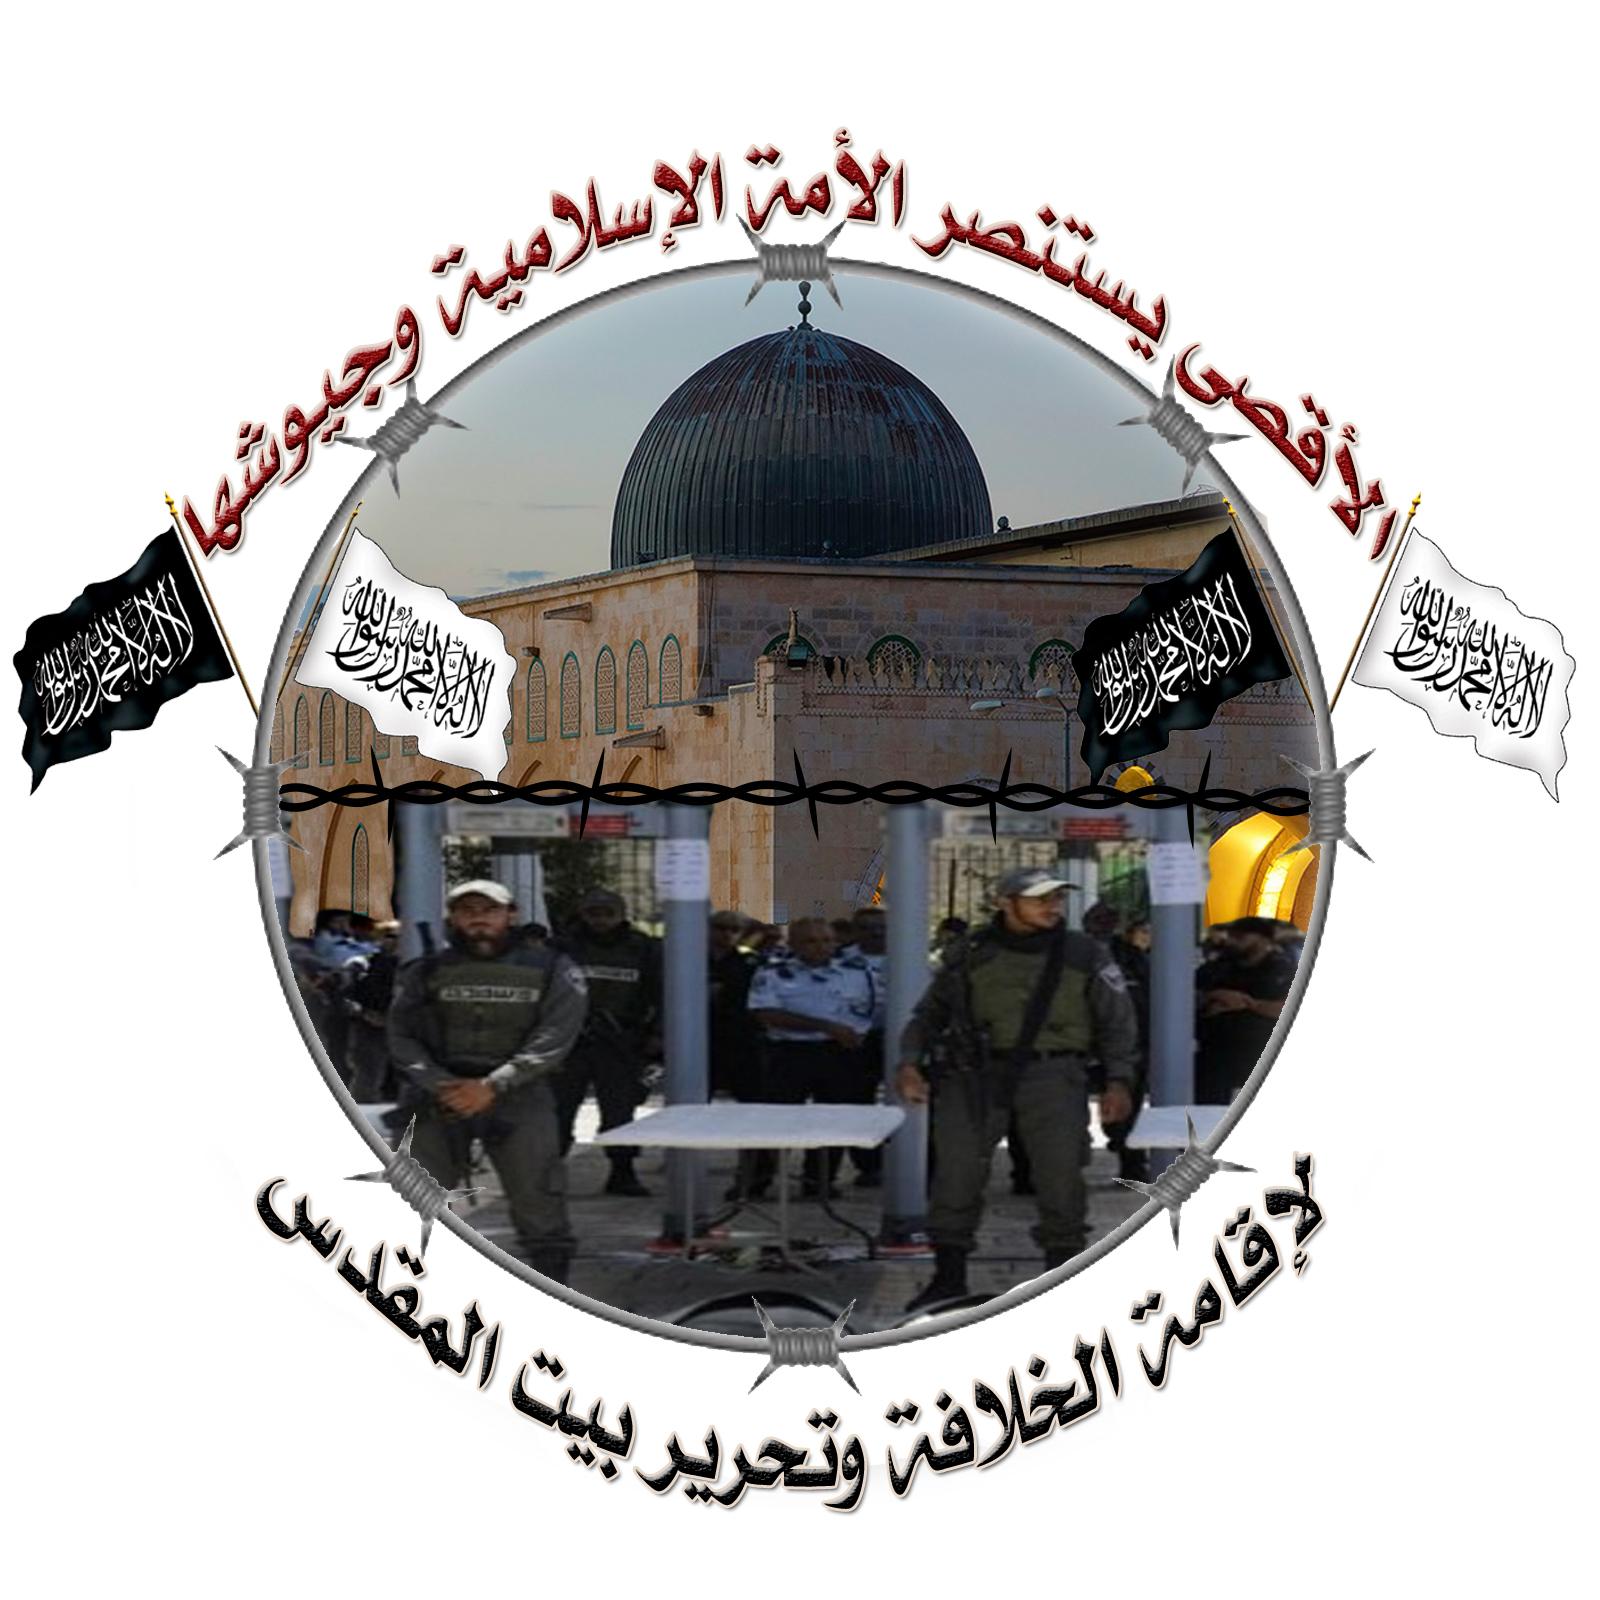 2017 07 Aqsa Logos AR